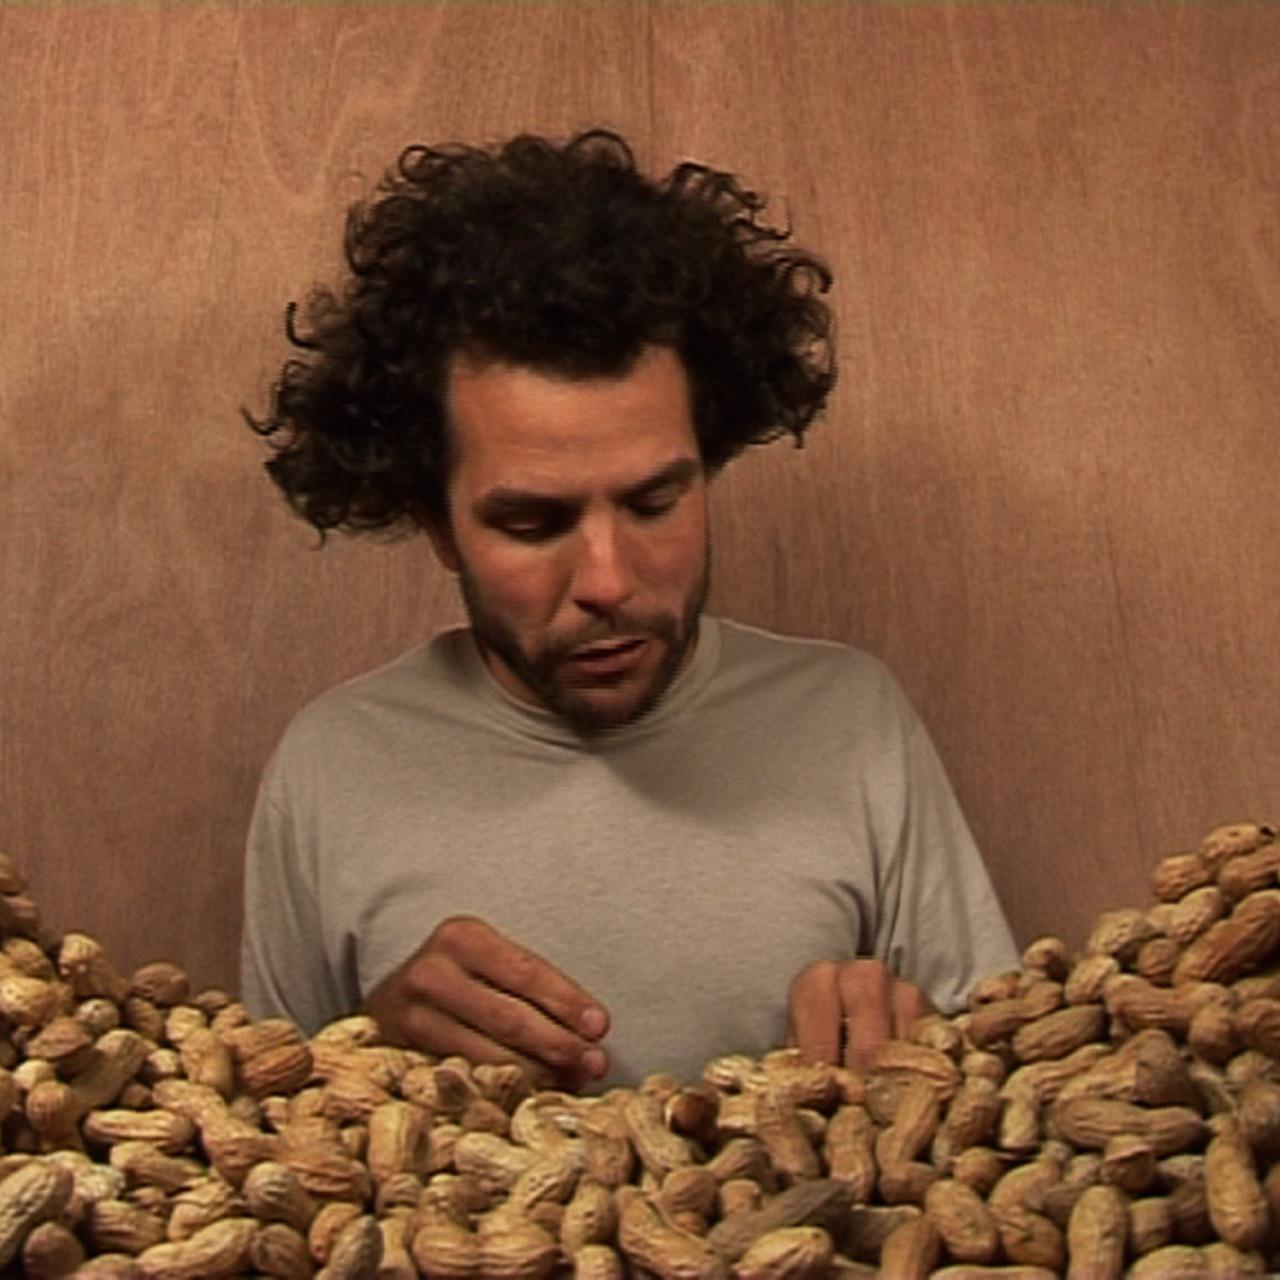 1WITHOUTnuts.jpg